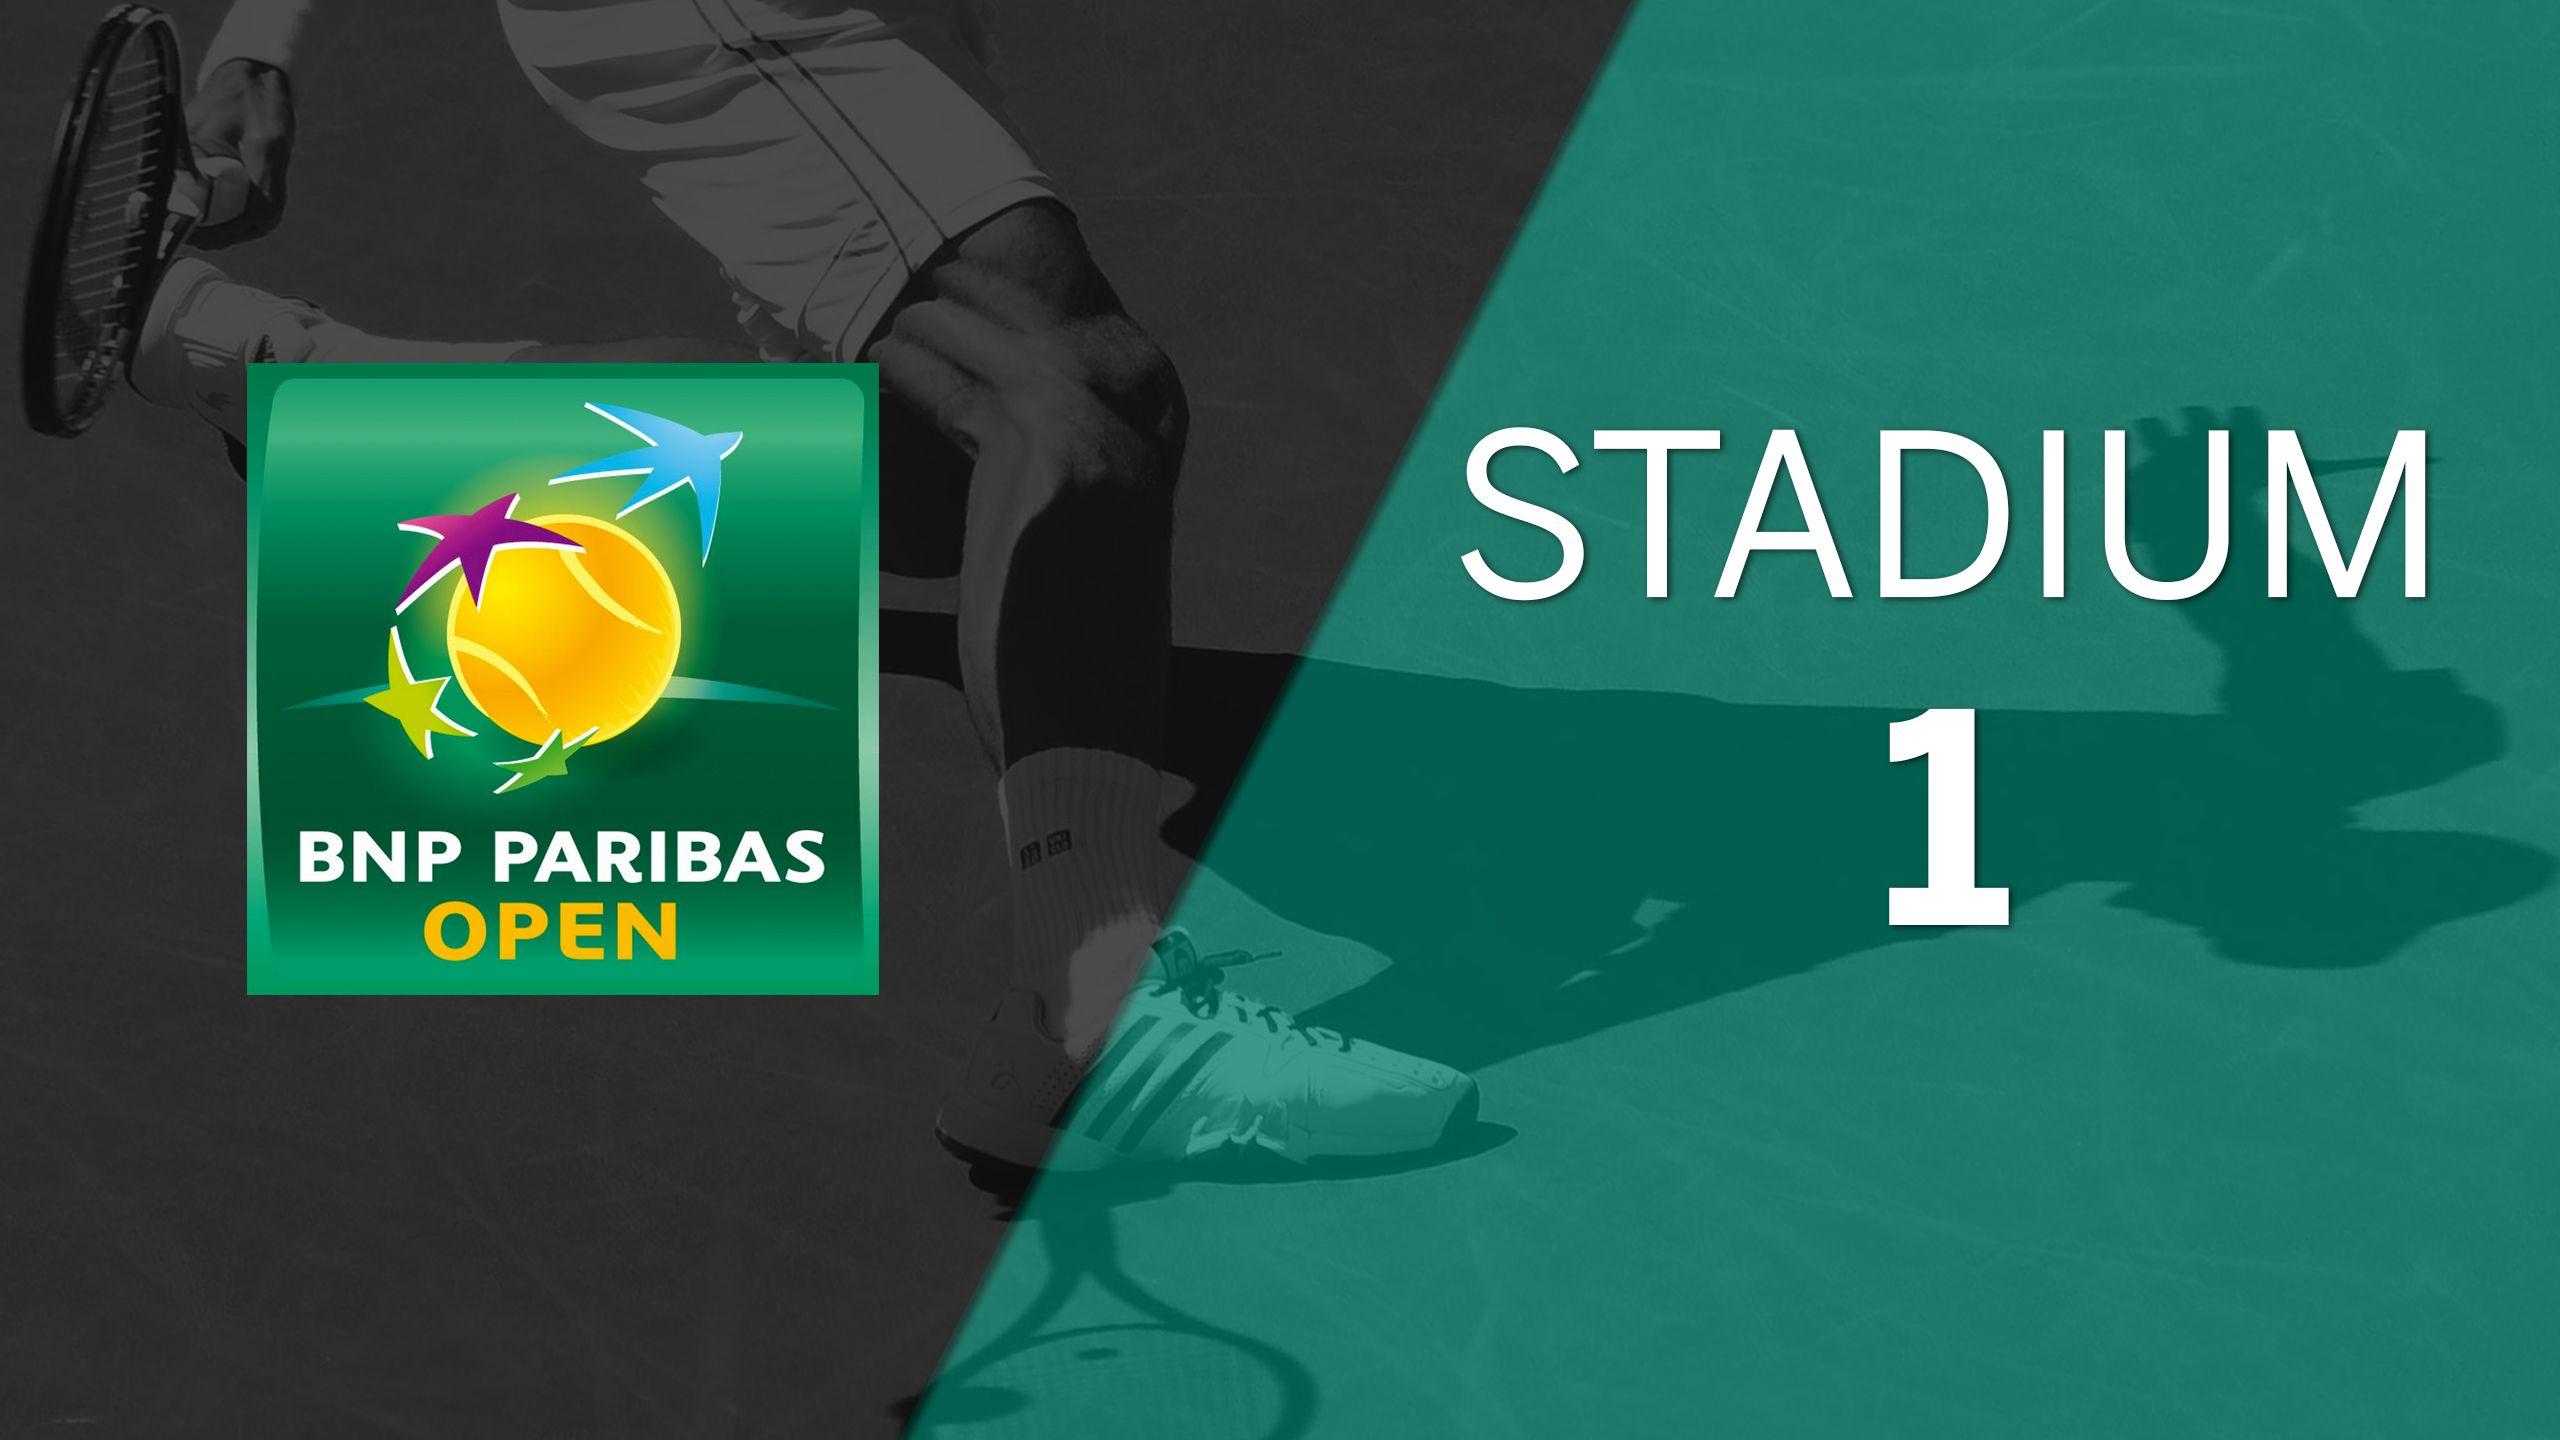 BNP Paribas Open - Stadium 1 (Doubles Championship)